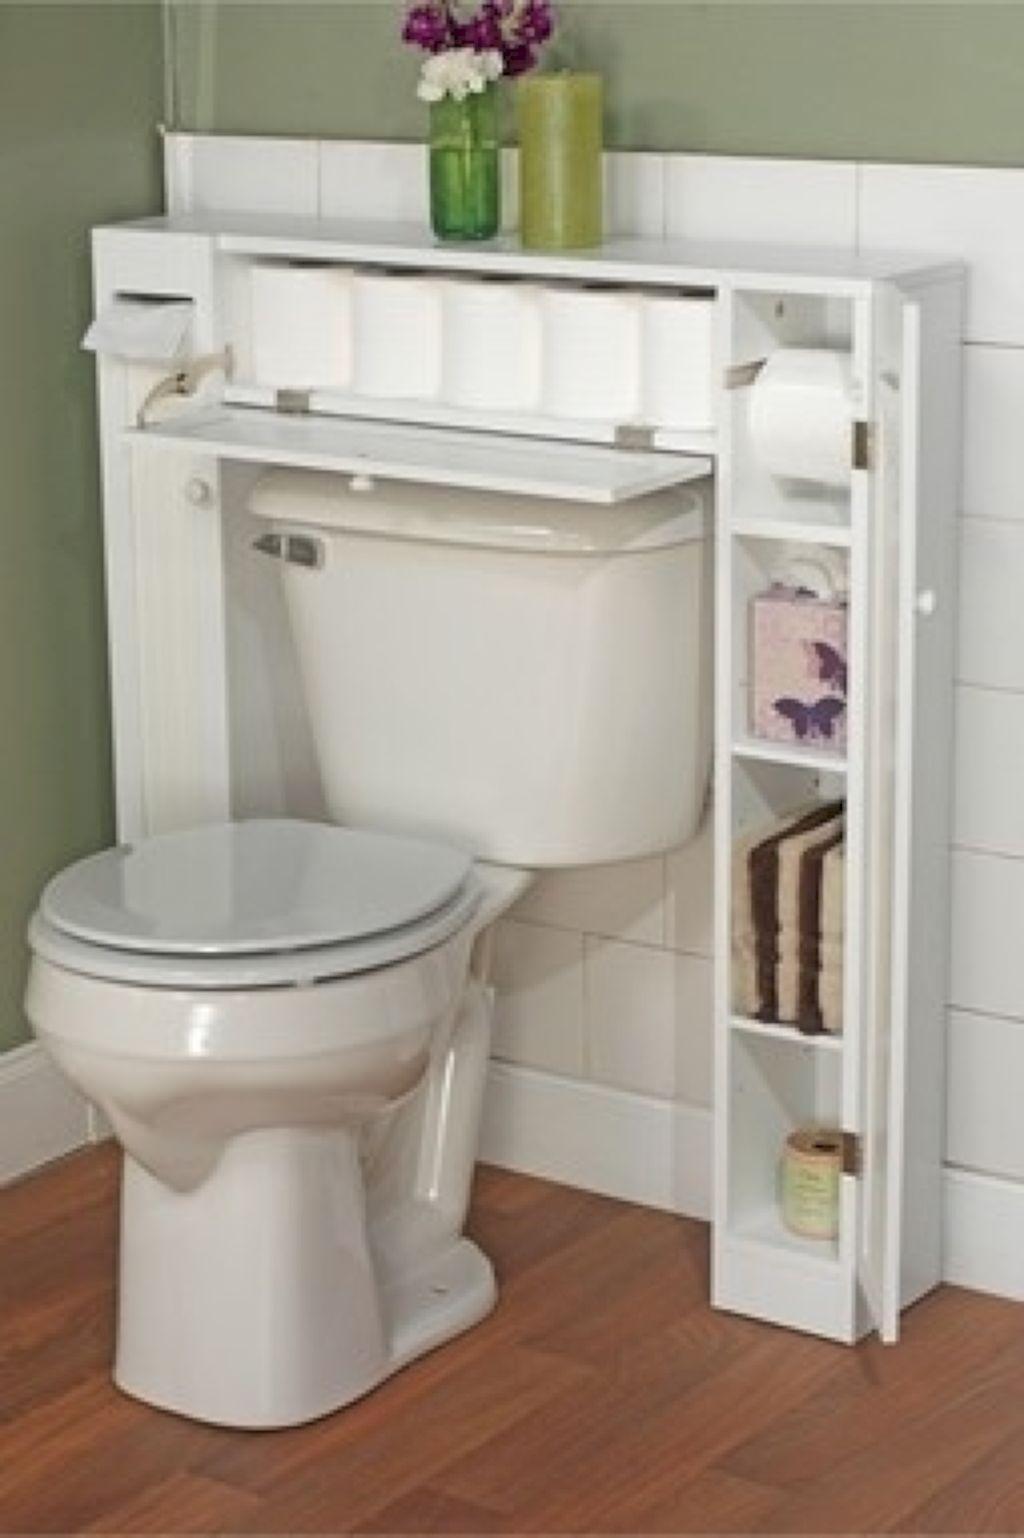 Small apartment bathroom ideas (34